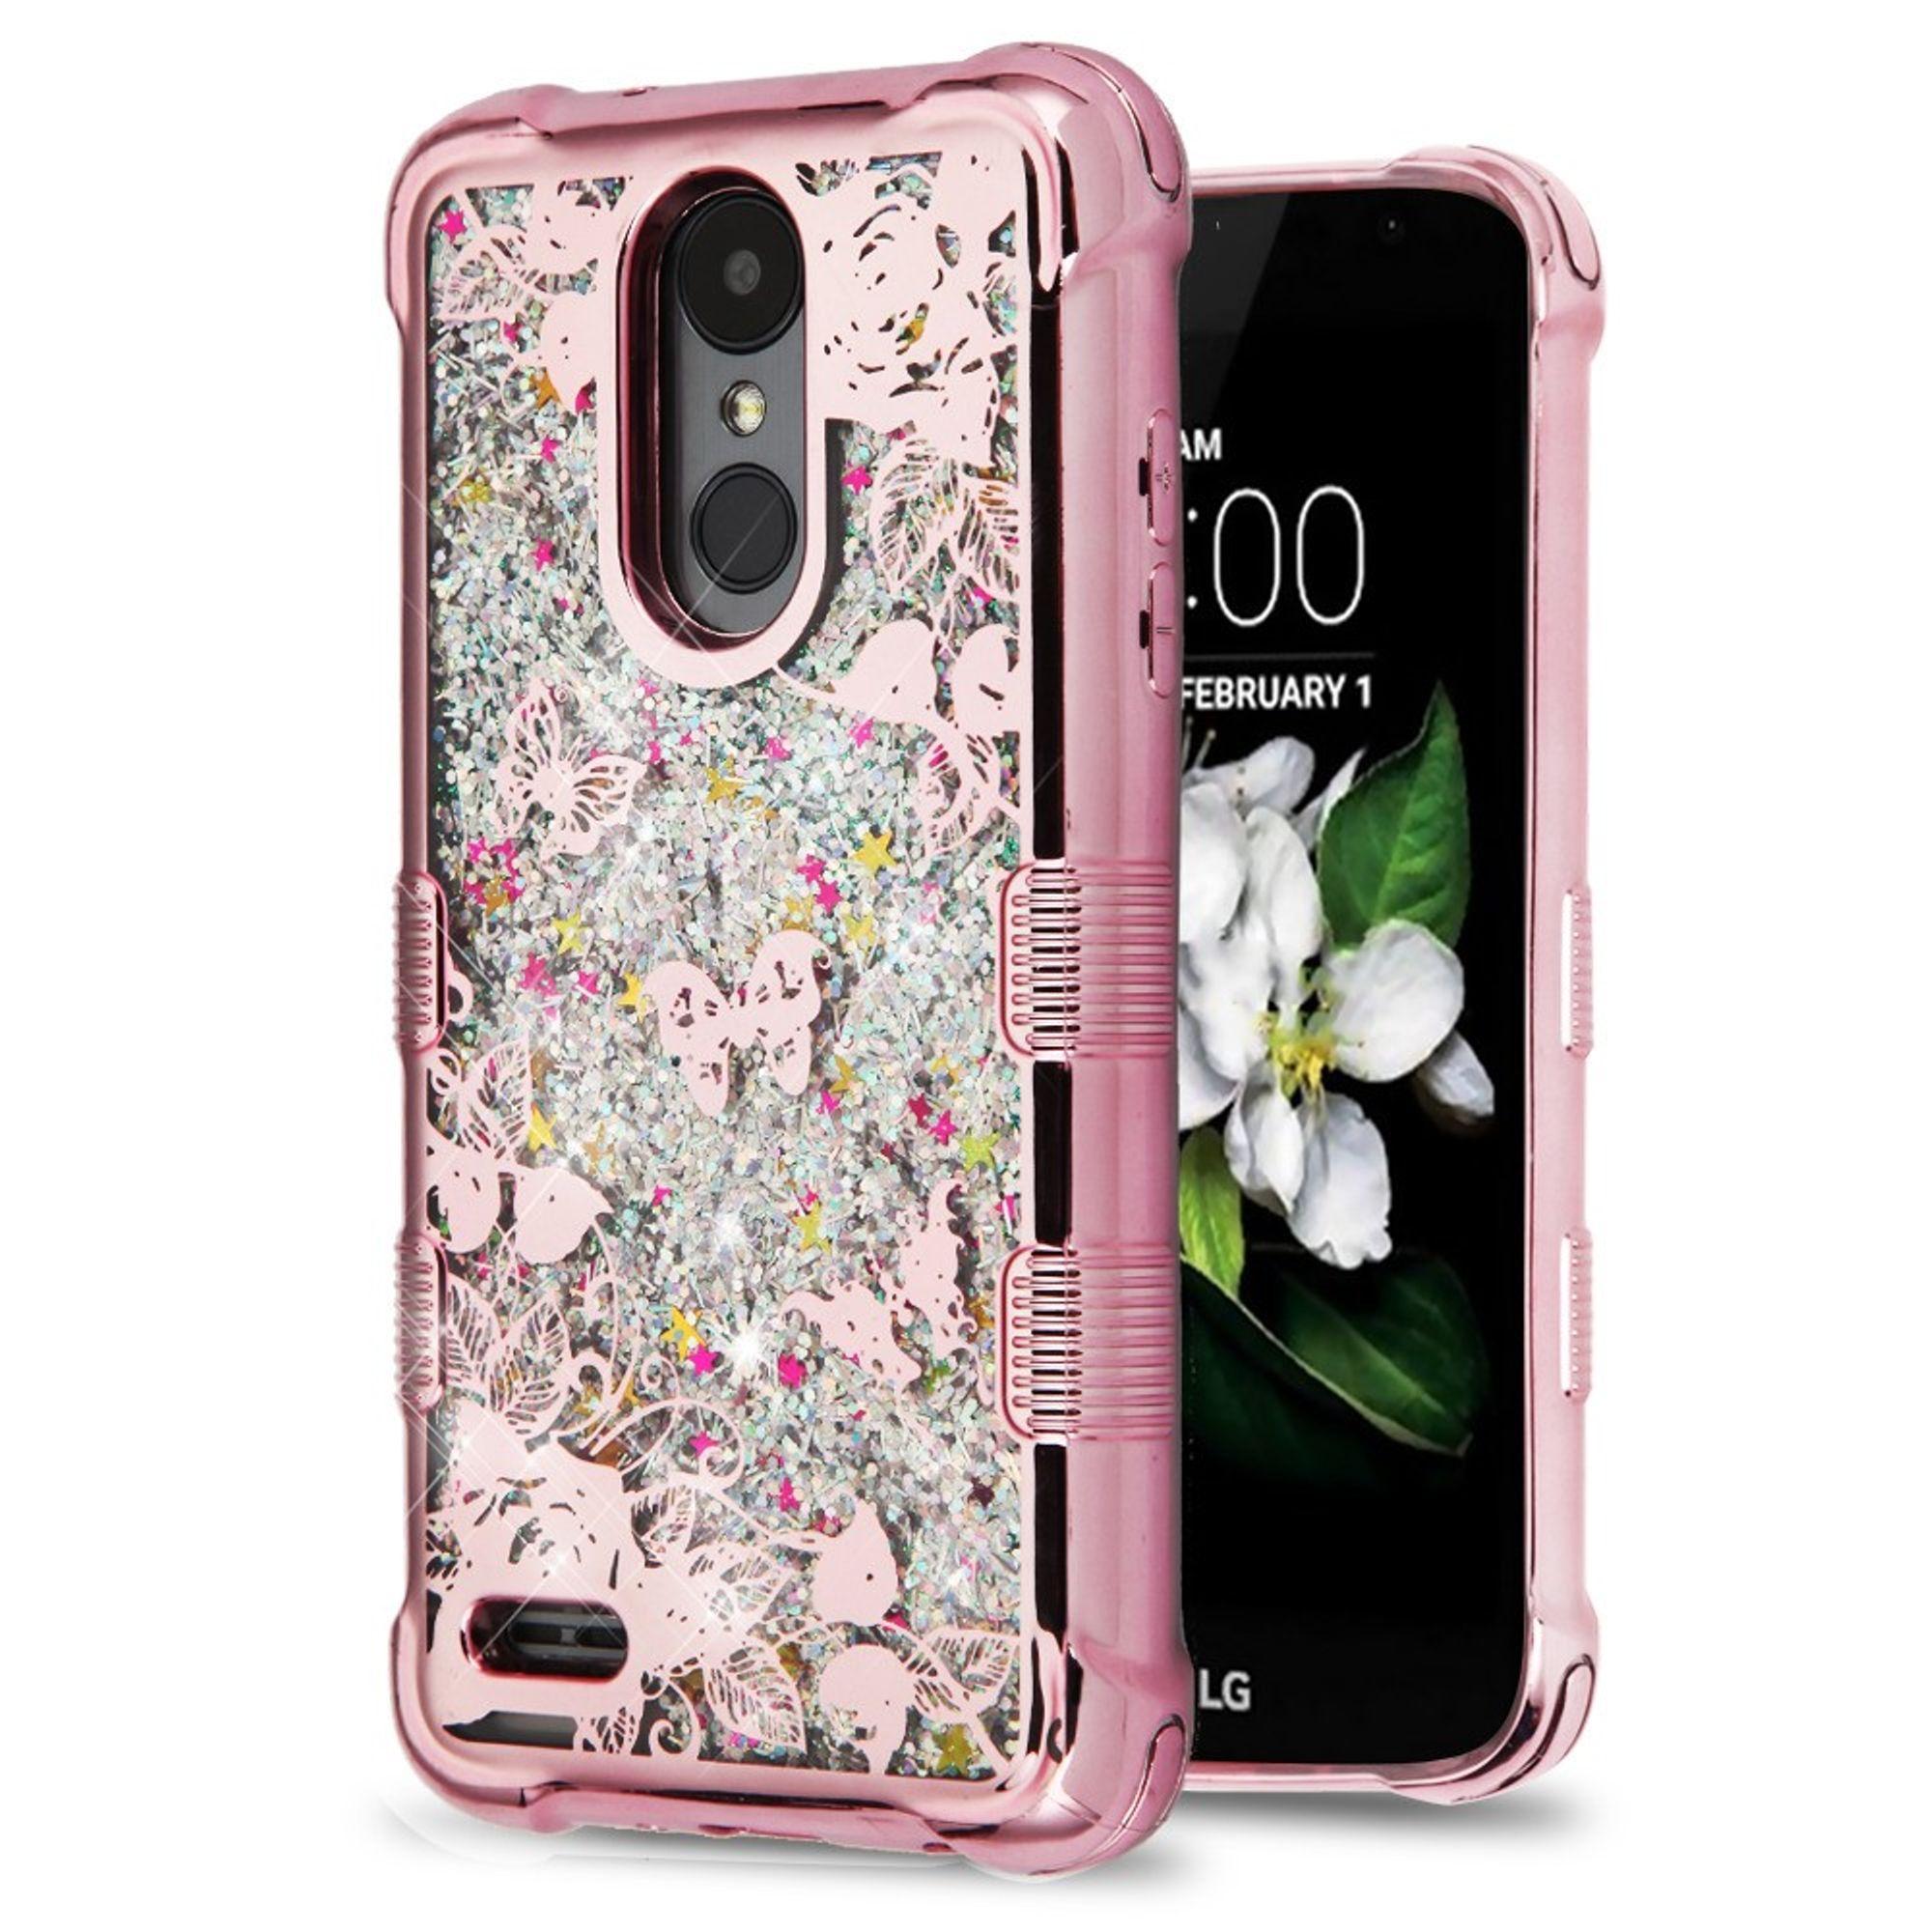 LG Aristo 2 case by Insten Luxury Quicksand Glitter Liquid Floating Sparkle Bling Fashion Phone Case Cover for LG Aristo 2 / Aristo 2 Plus / Fortune 2 / K8 2018 / Risio 3 / Zone 4